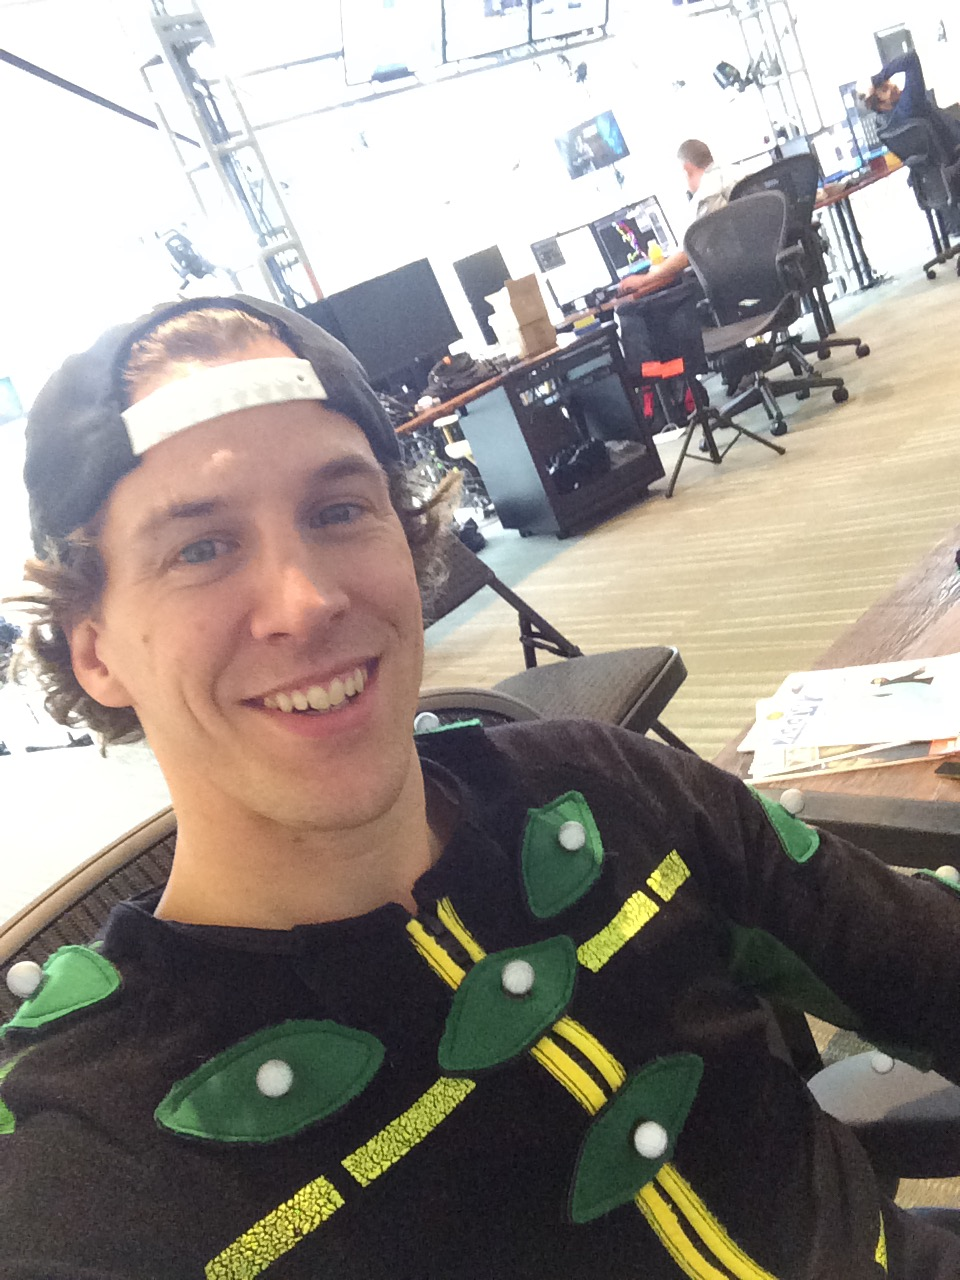 Jesse in a motion capture suit